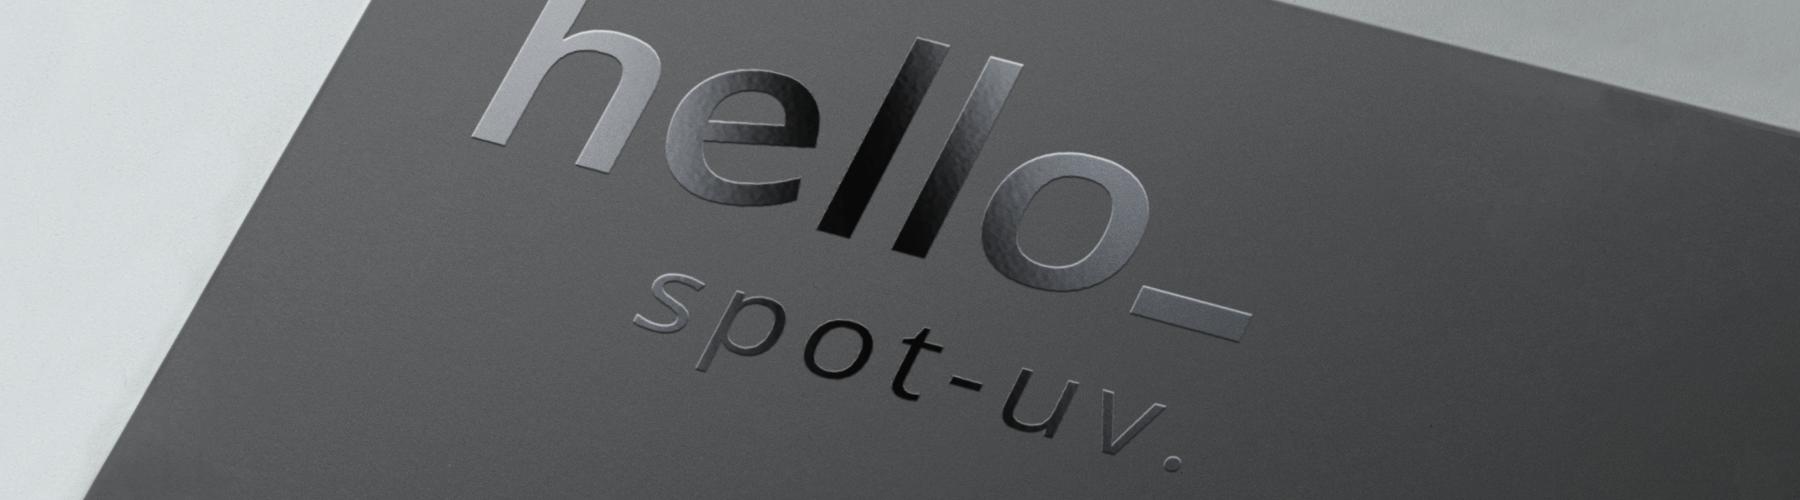 Manual Para Tarjetas con Barniz Selectivo (Spot UV)